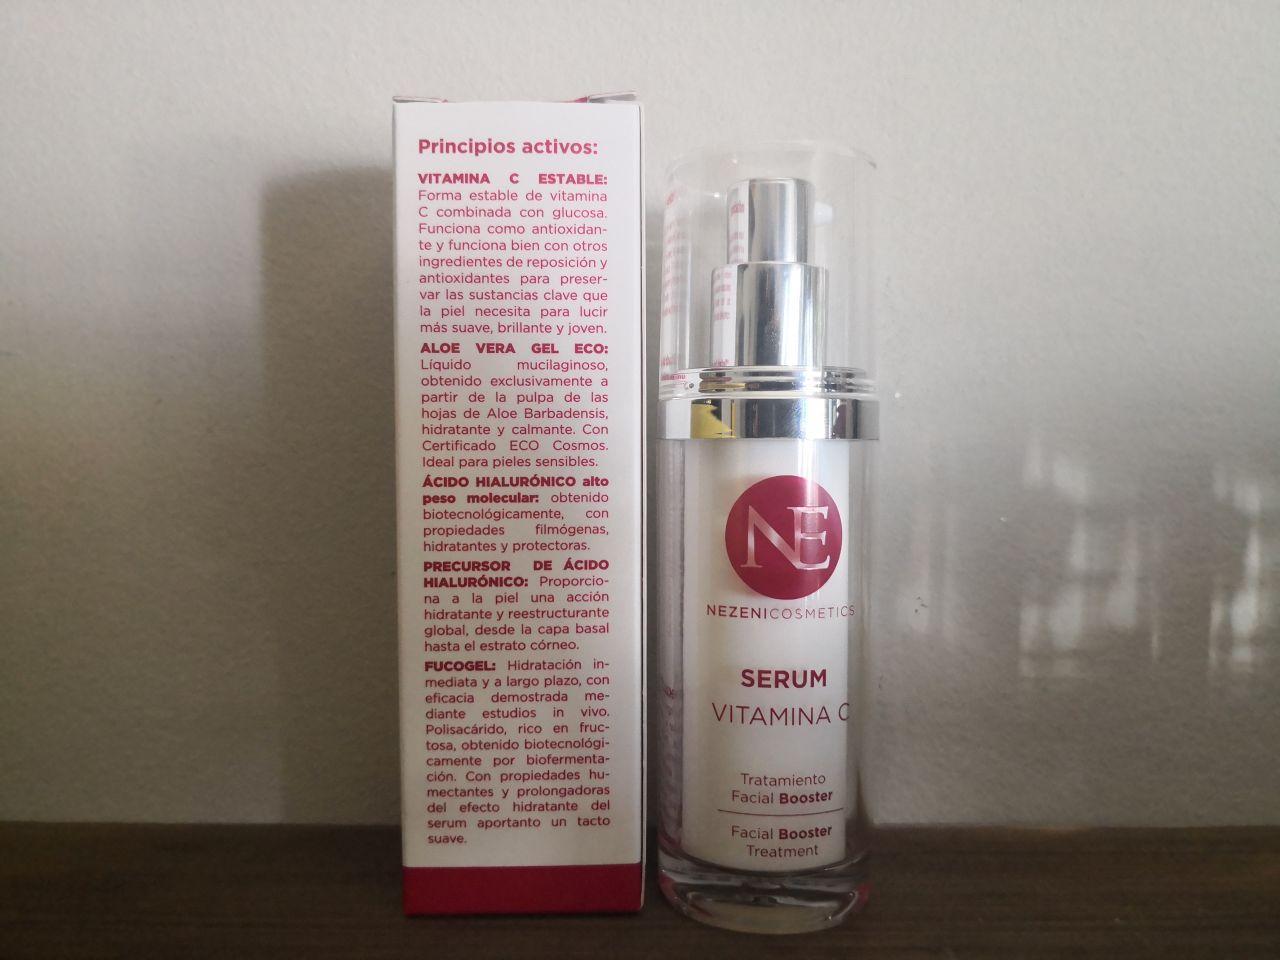 Serum vitamina C Nezeni Cosmetics: mi opinión